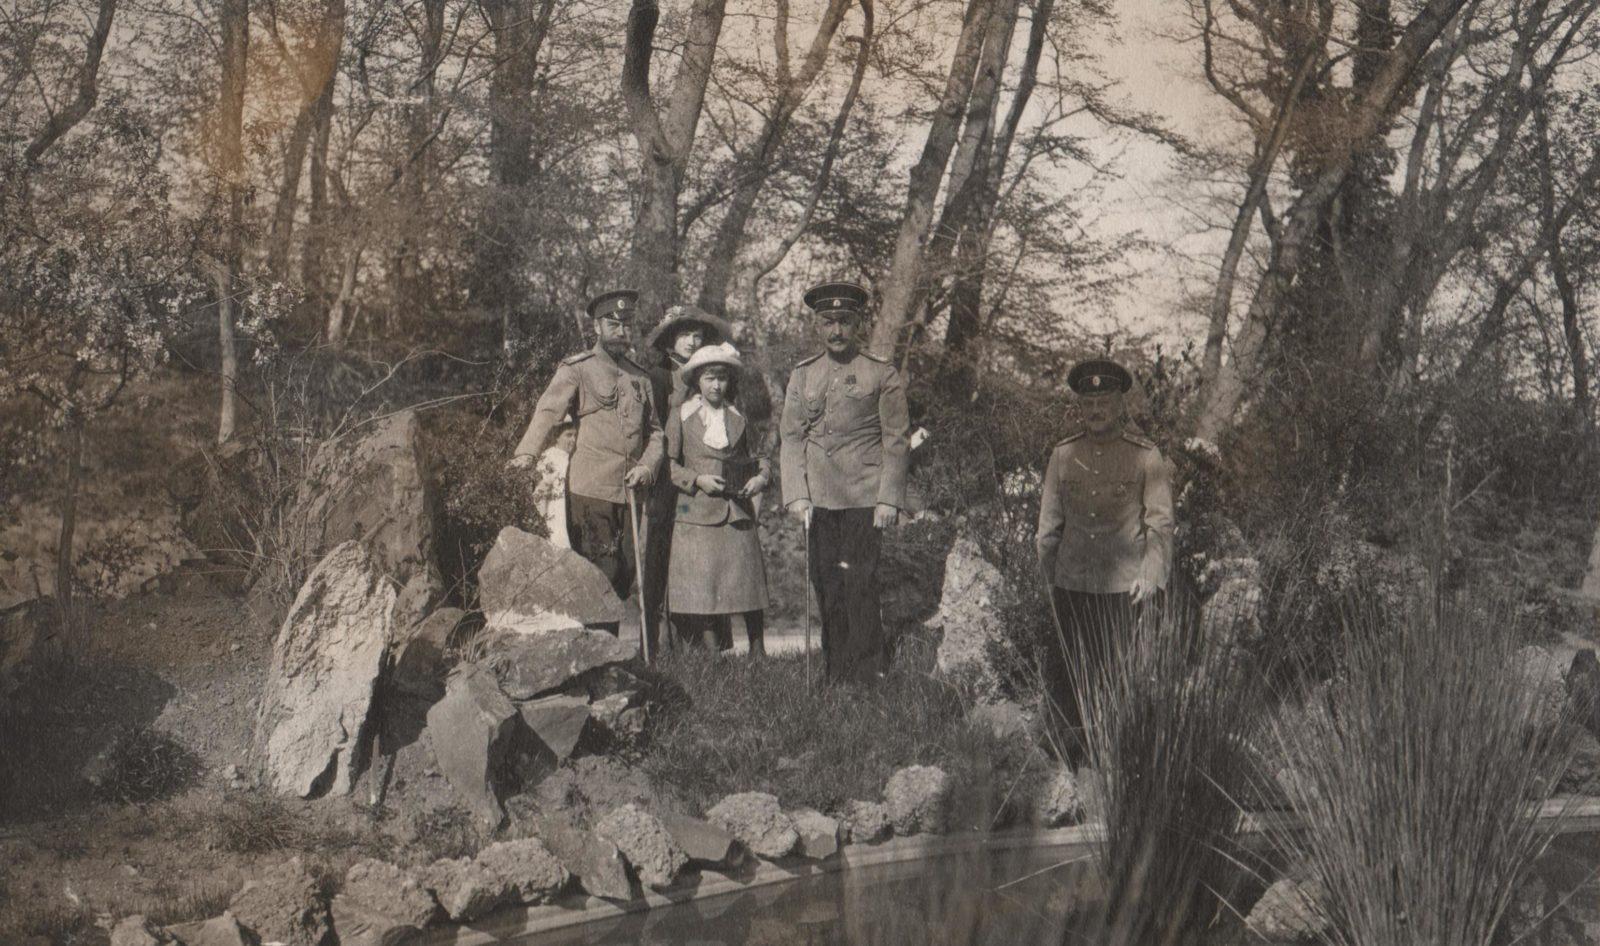 Grand Duchesses Olga, Tatiana, Maria, Anastasia. Livadia, 1914